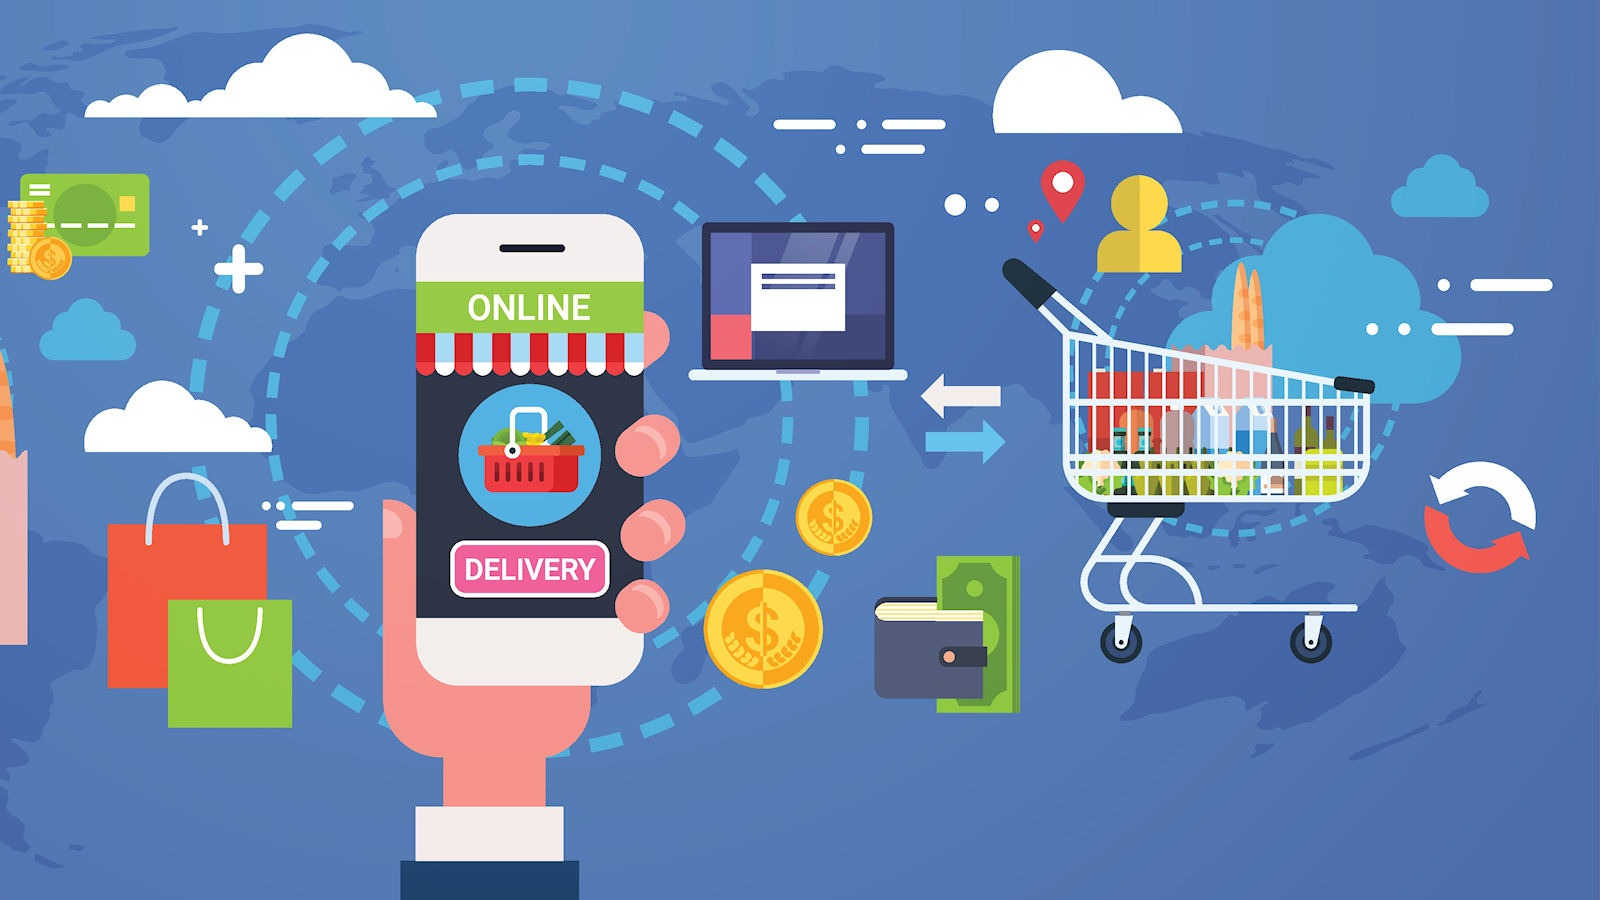 Mød Wayfair, Newegg og andre online markedspladser - DI Handel